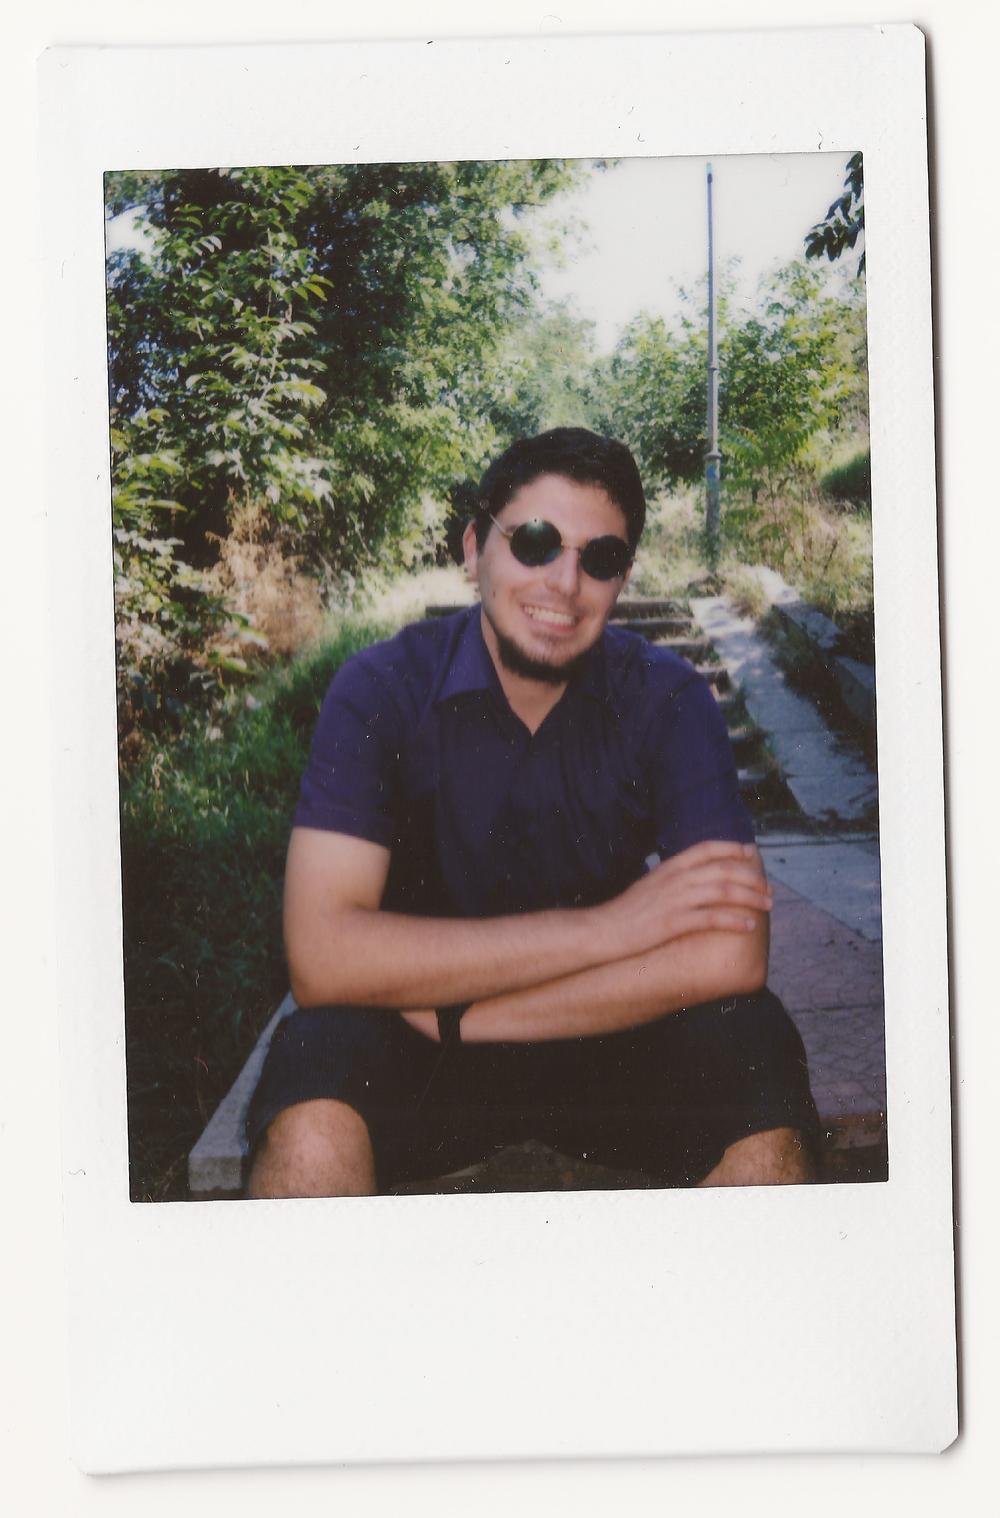 Pika Polaroid.jpg